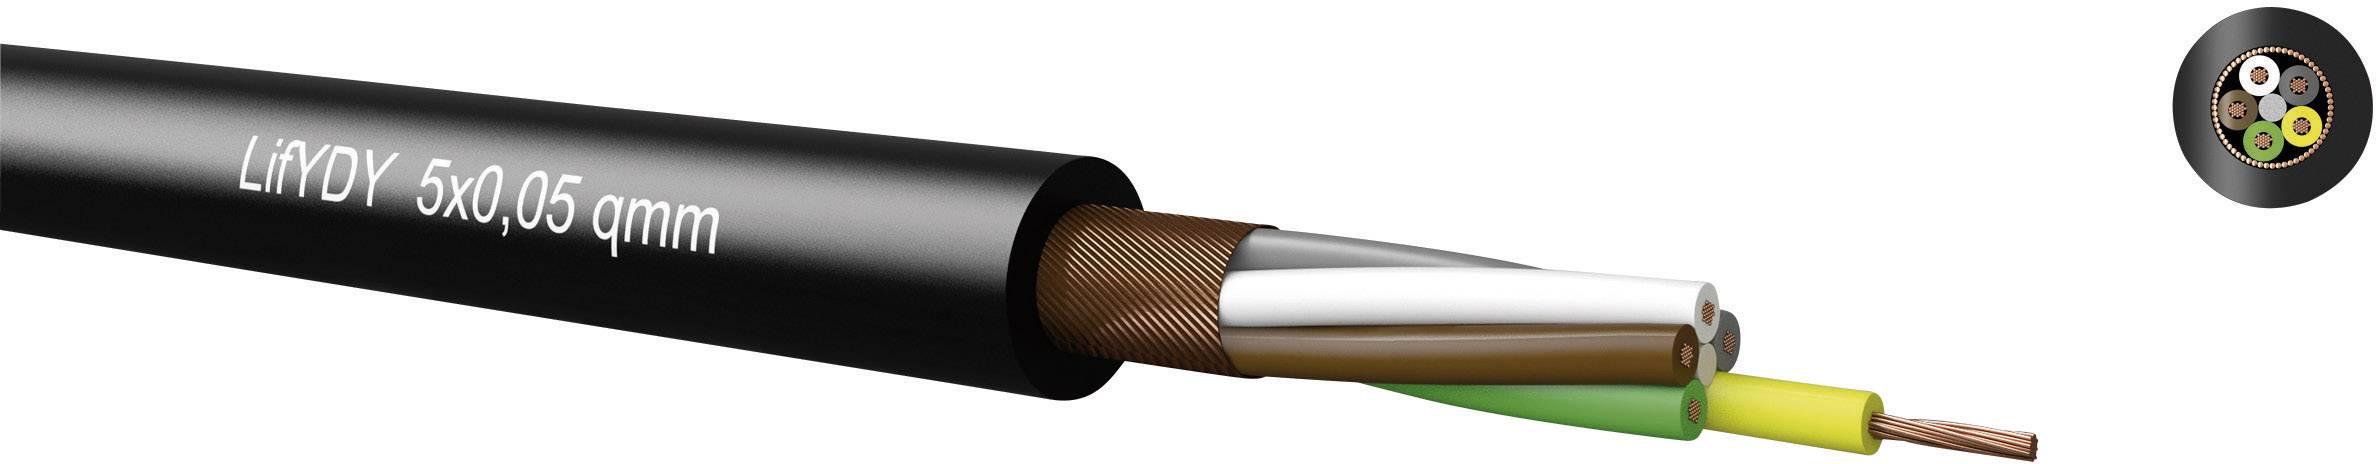 Riadiaci kábel Kabeltronik LifYDY 340700500, 7 x 0.05 mm², vonkajší Ø 3.40 mm, 100 V, metrový tovar, čierna